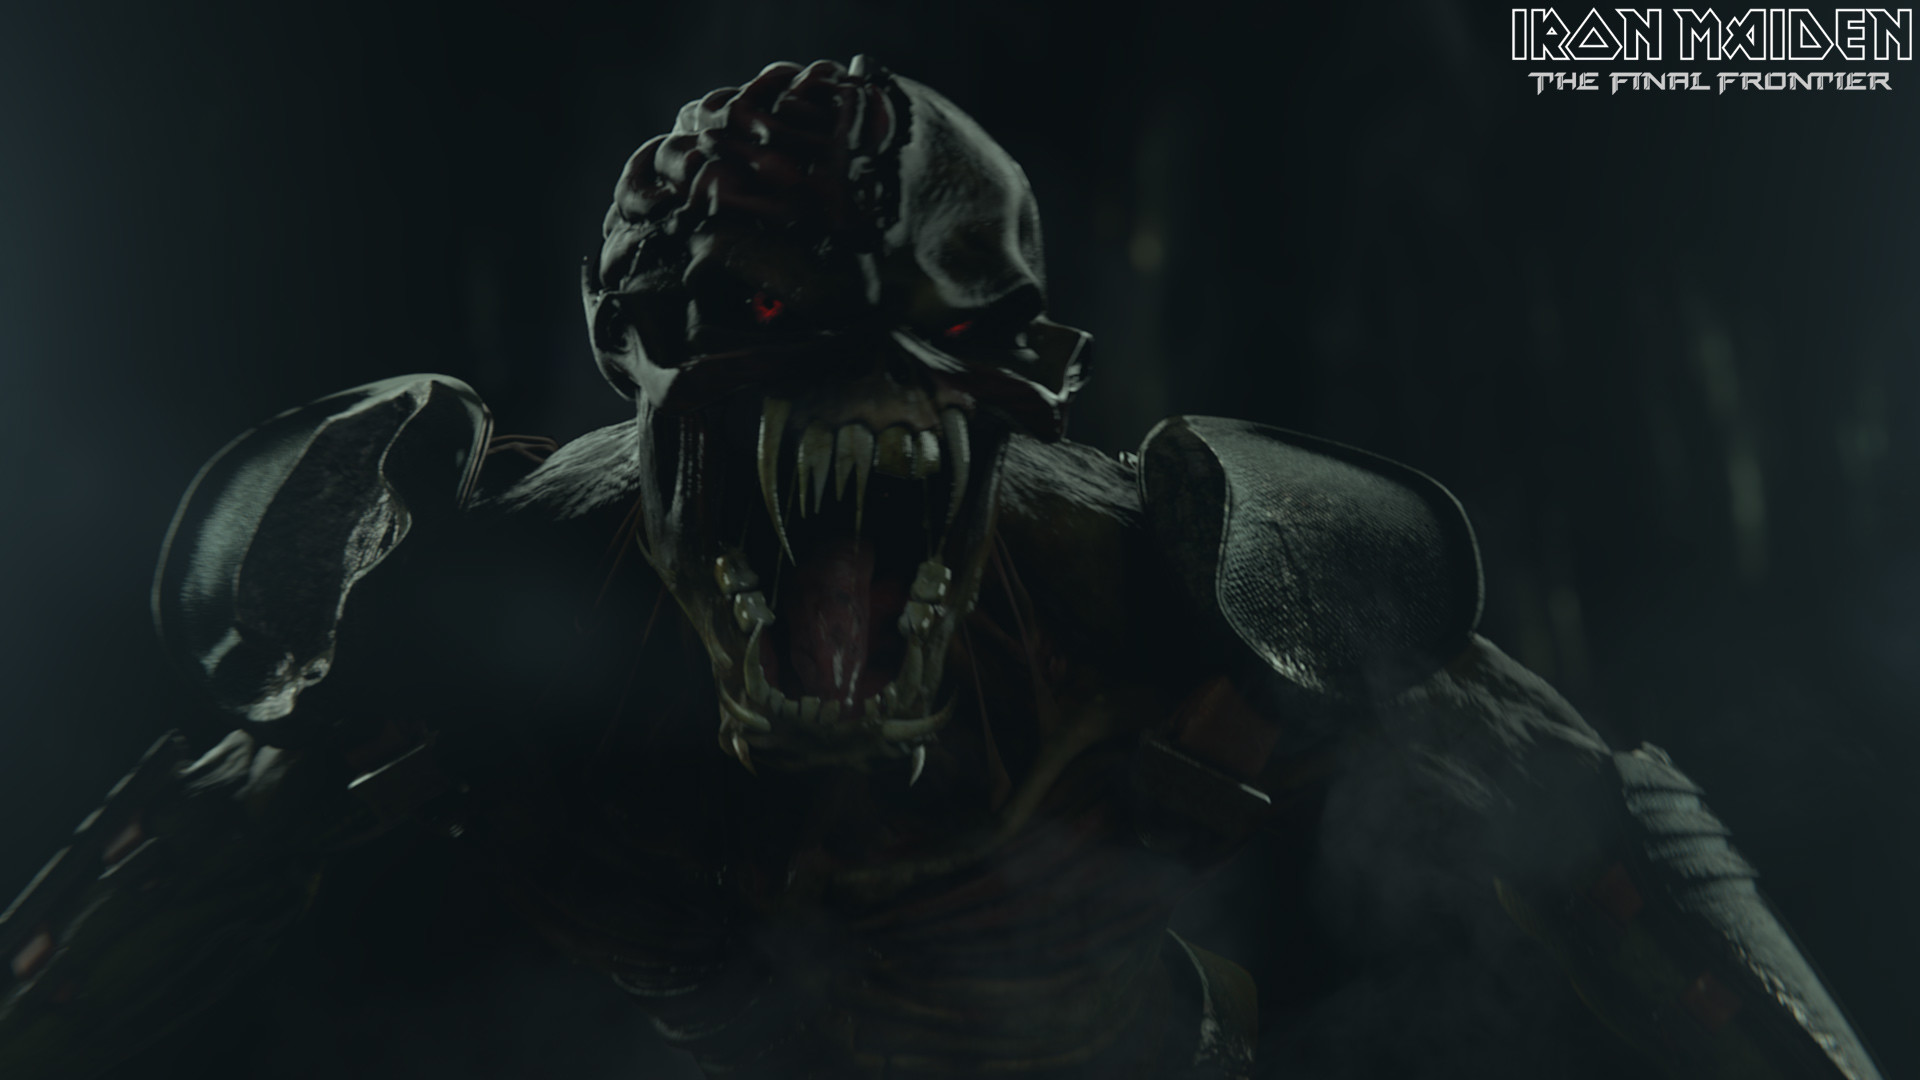 Iron Maiden heavy metal rock eddie monster creature dark wallpaper .